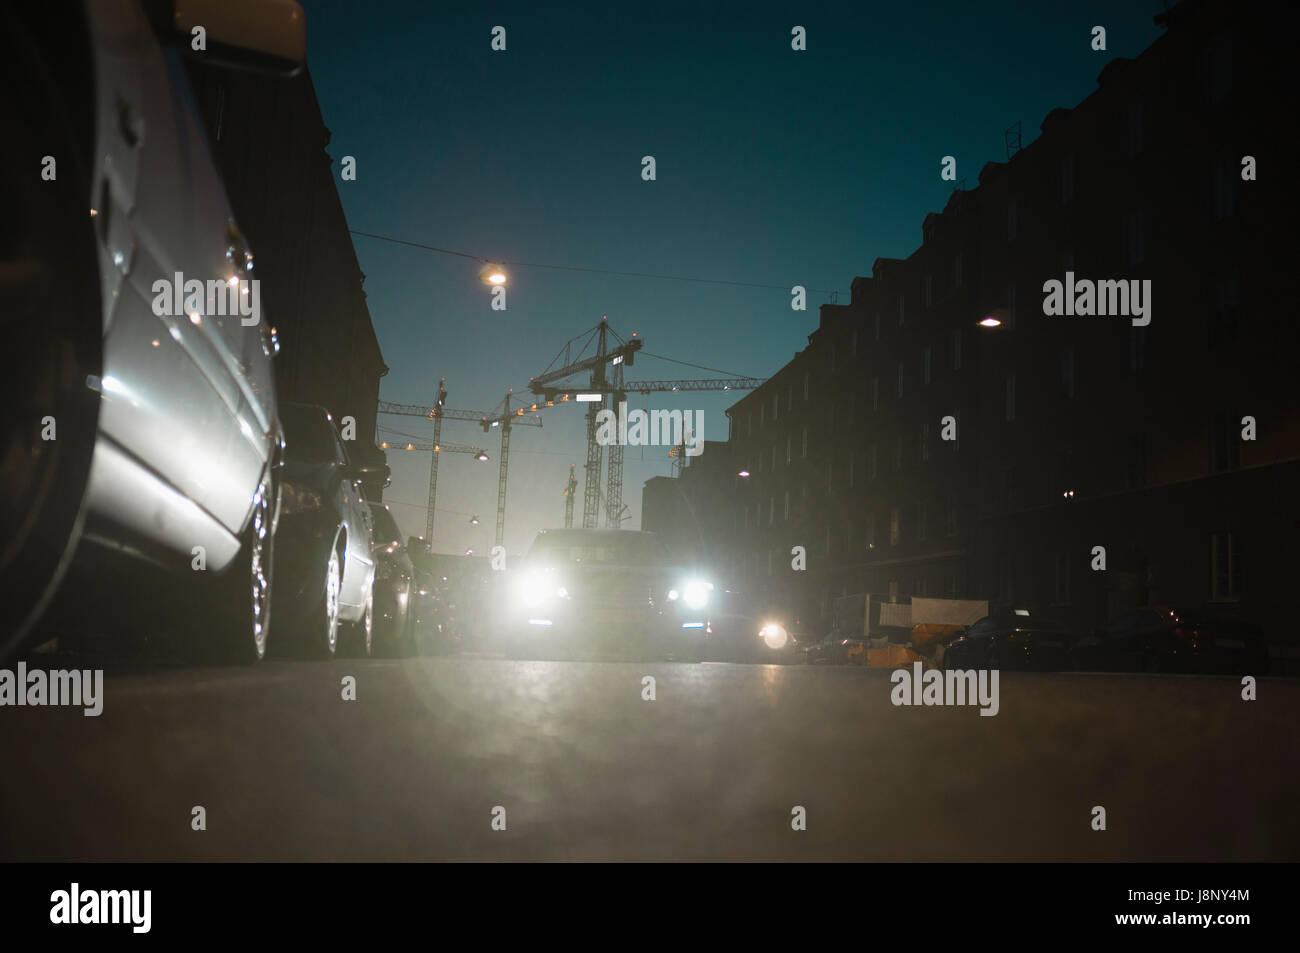 Traffic at night - Stock Image